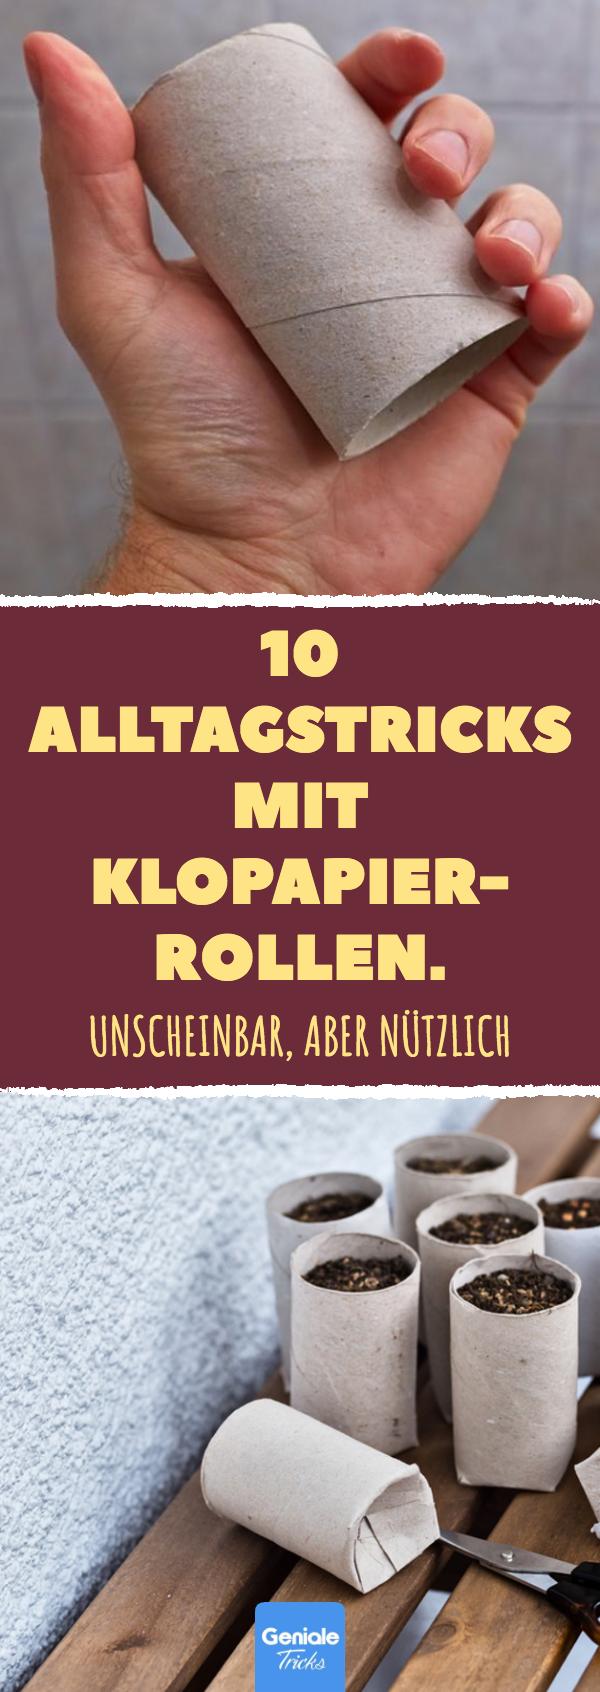 10 Alltagstricks mit Klopapierrollen. #diy #upcycling #bastelideen #toilettenpapier #life #hacks #klopapierrolle #basteln #toilettenpapier #klorolle #toiletpaperrolldecor